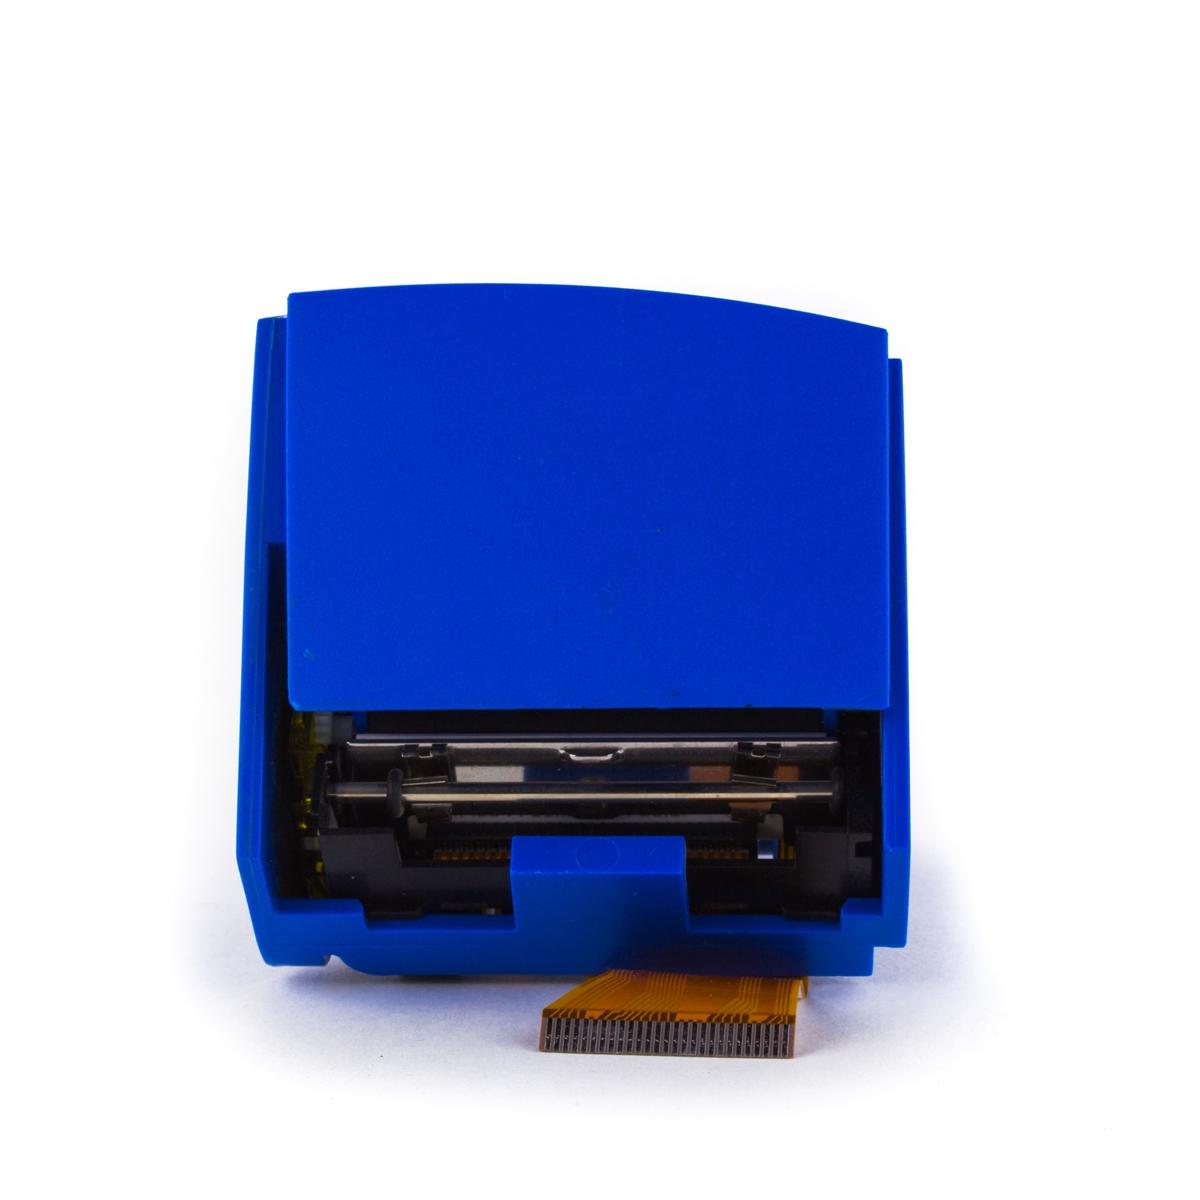 GE Carescape V100 Vital Signs Monitor Printer Recorder Assembly